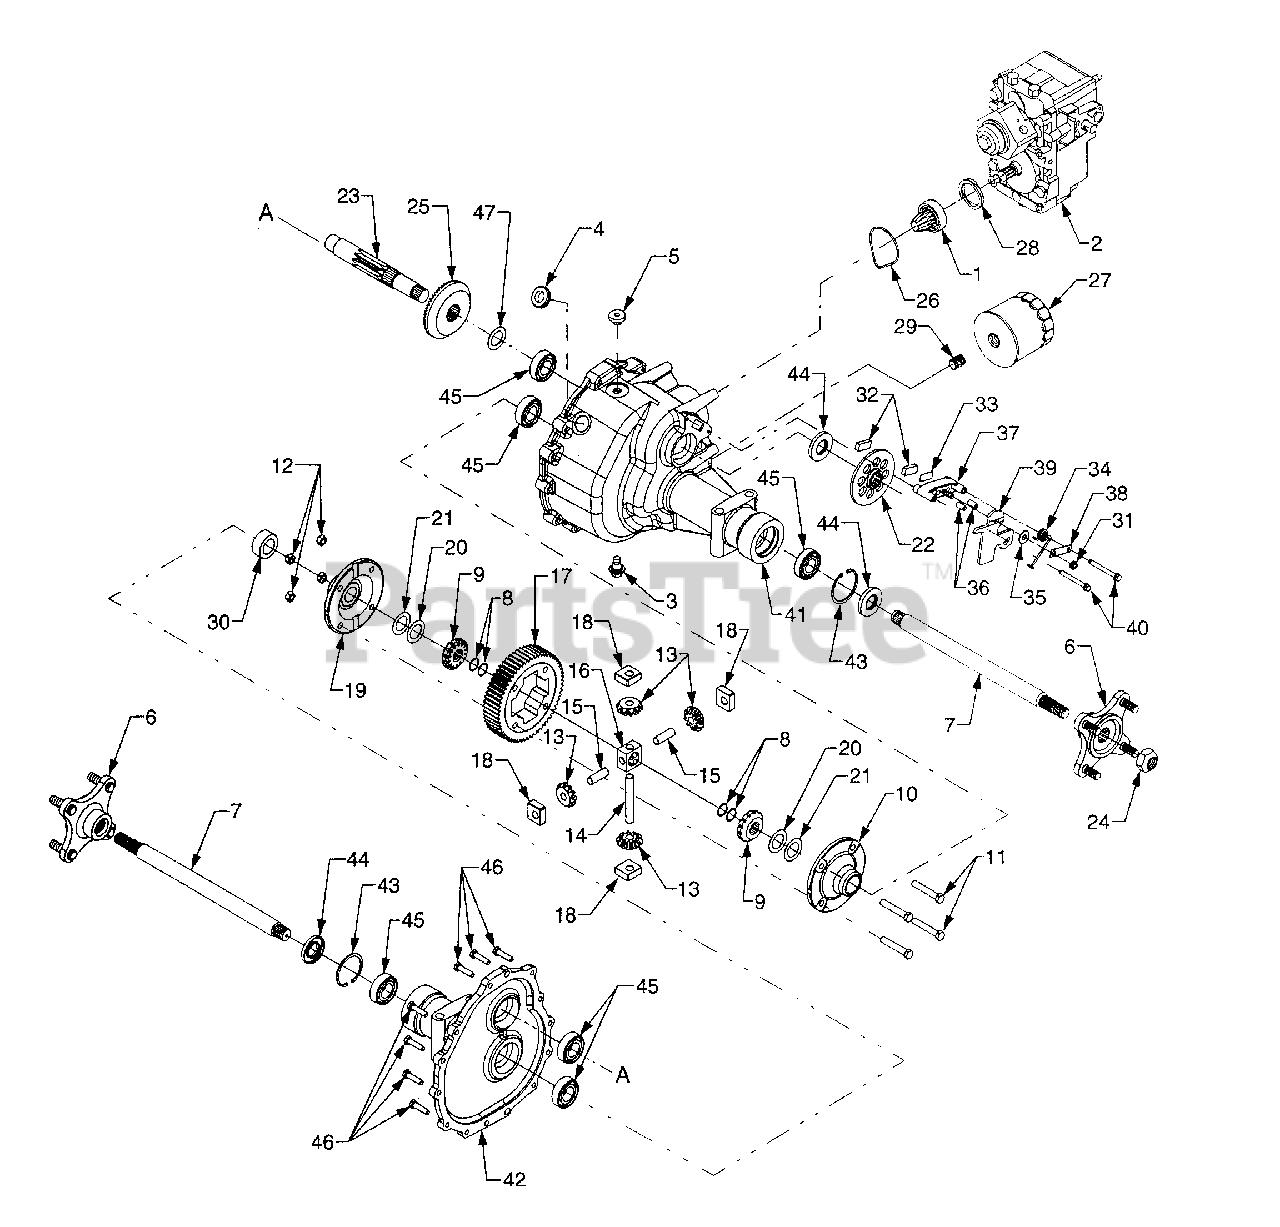 [DIAGRAM] Cub Cadet 3184 Wiring Diagram FULL Version HD